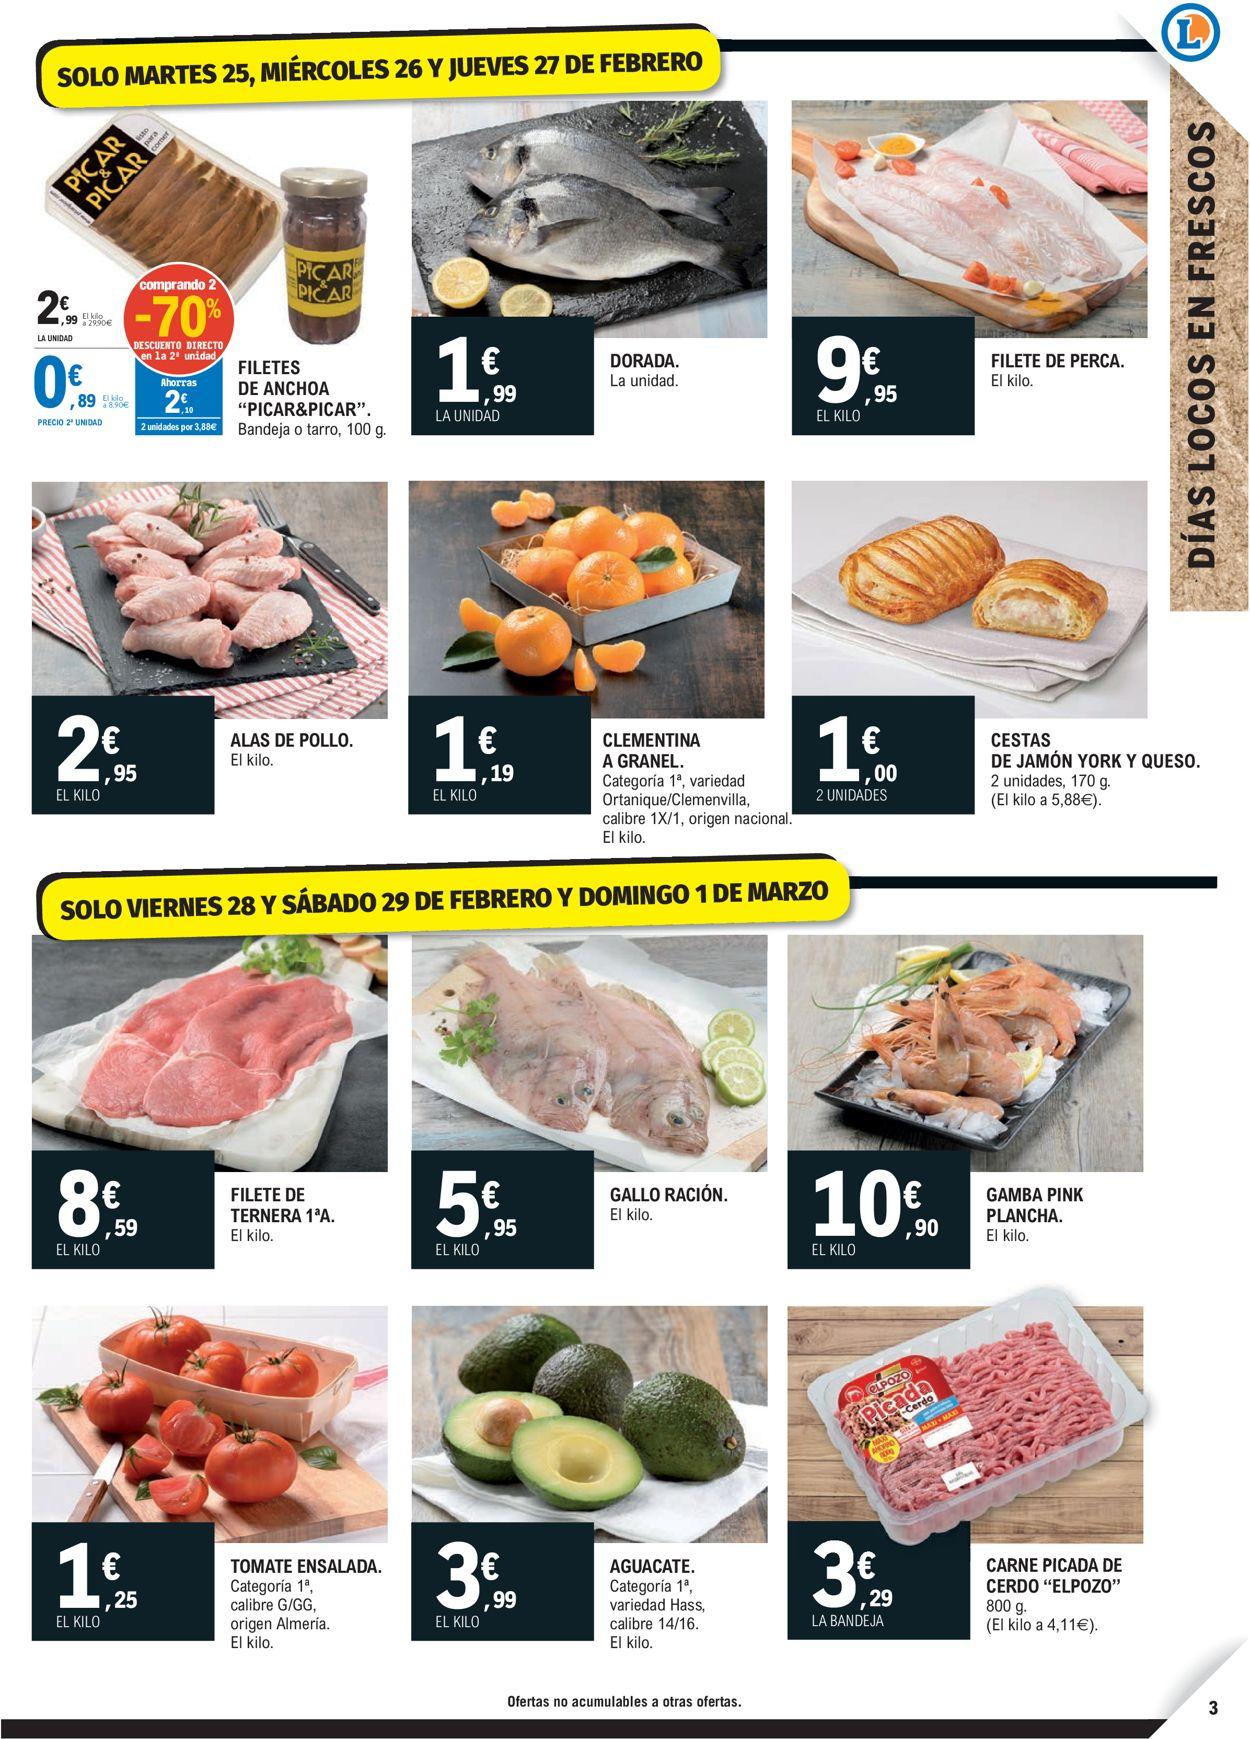 E.leclerc Folleto - 19.02-01.03.2020 (Página 3)